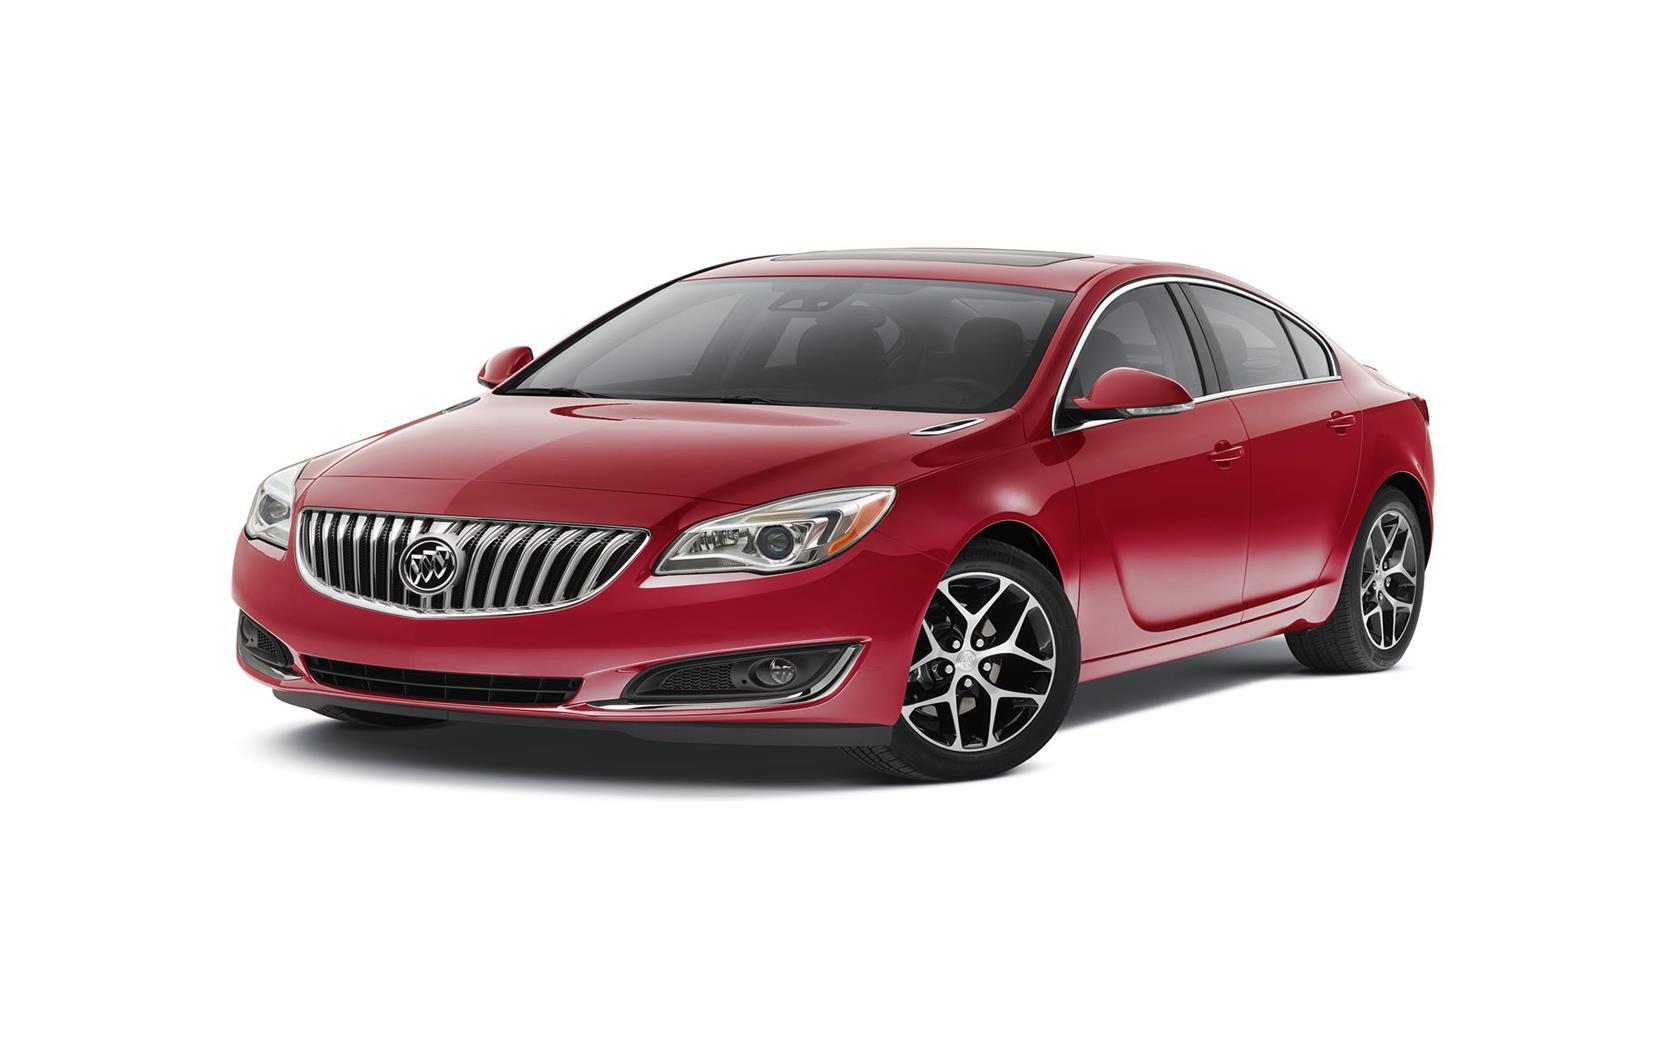 Buick Regal седан